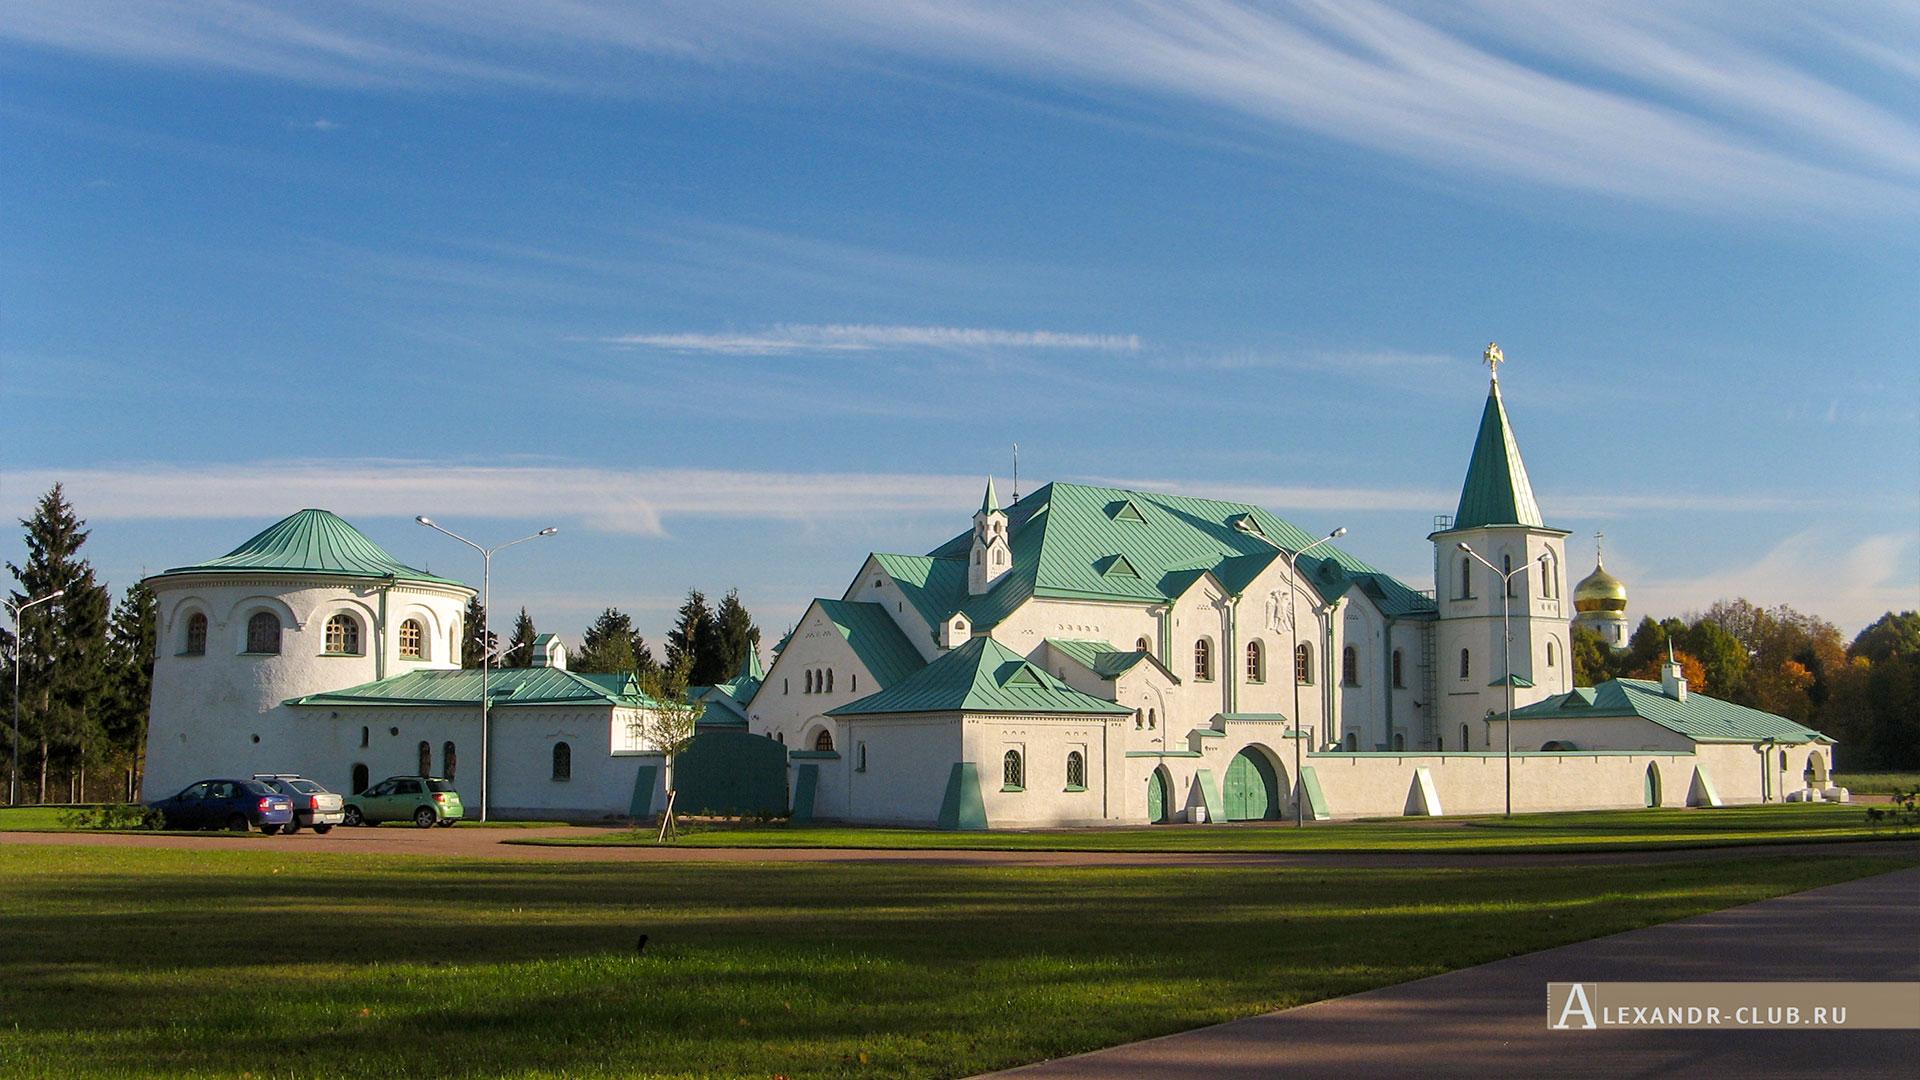 Царское Село, лето, Александровский парк, Ратная палата